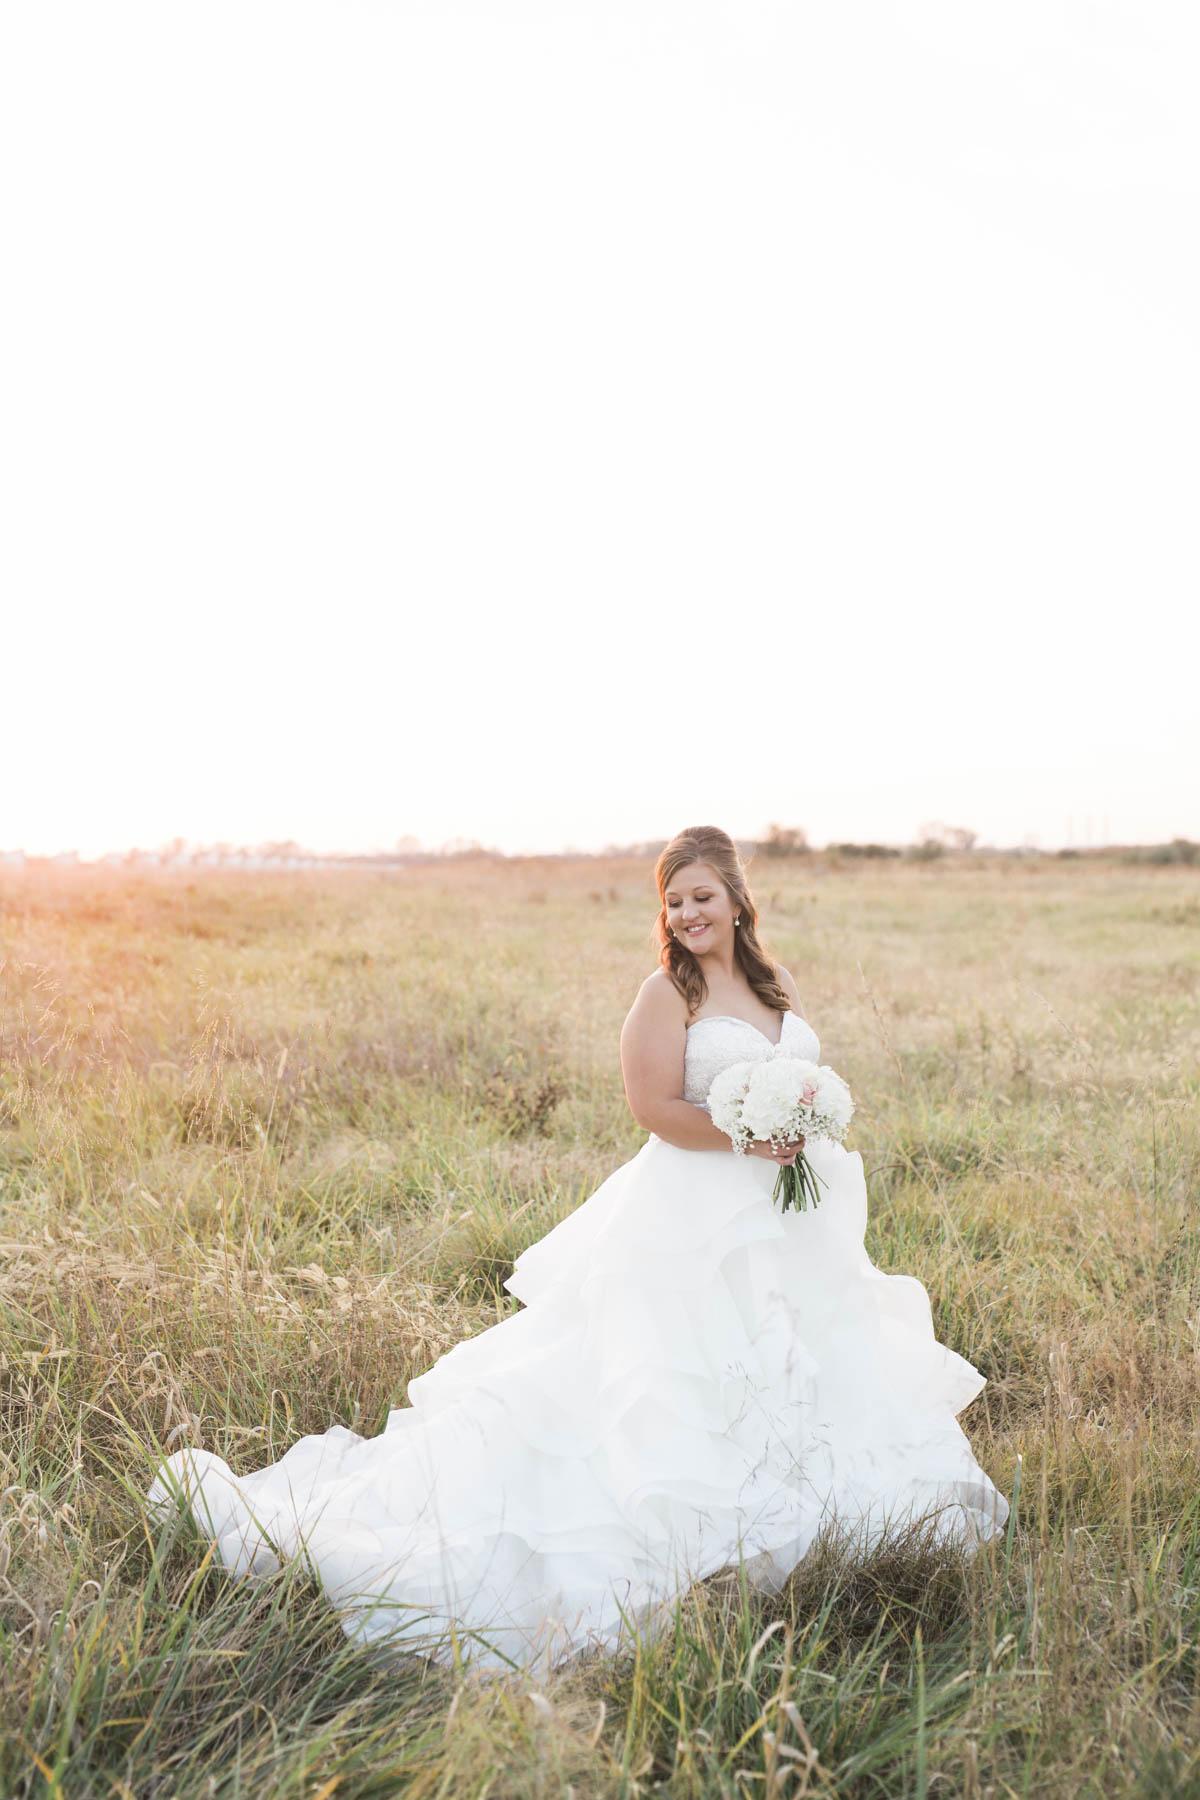 shotbychelsea_blog_wedding-28.jpg